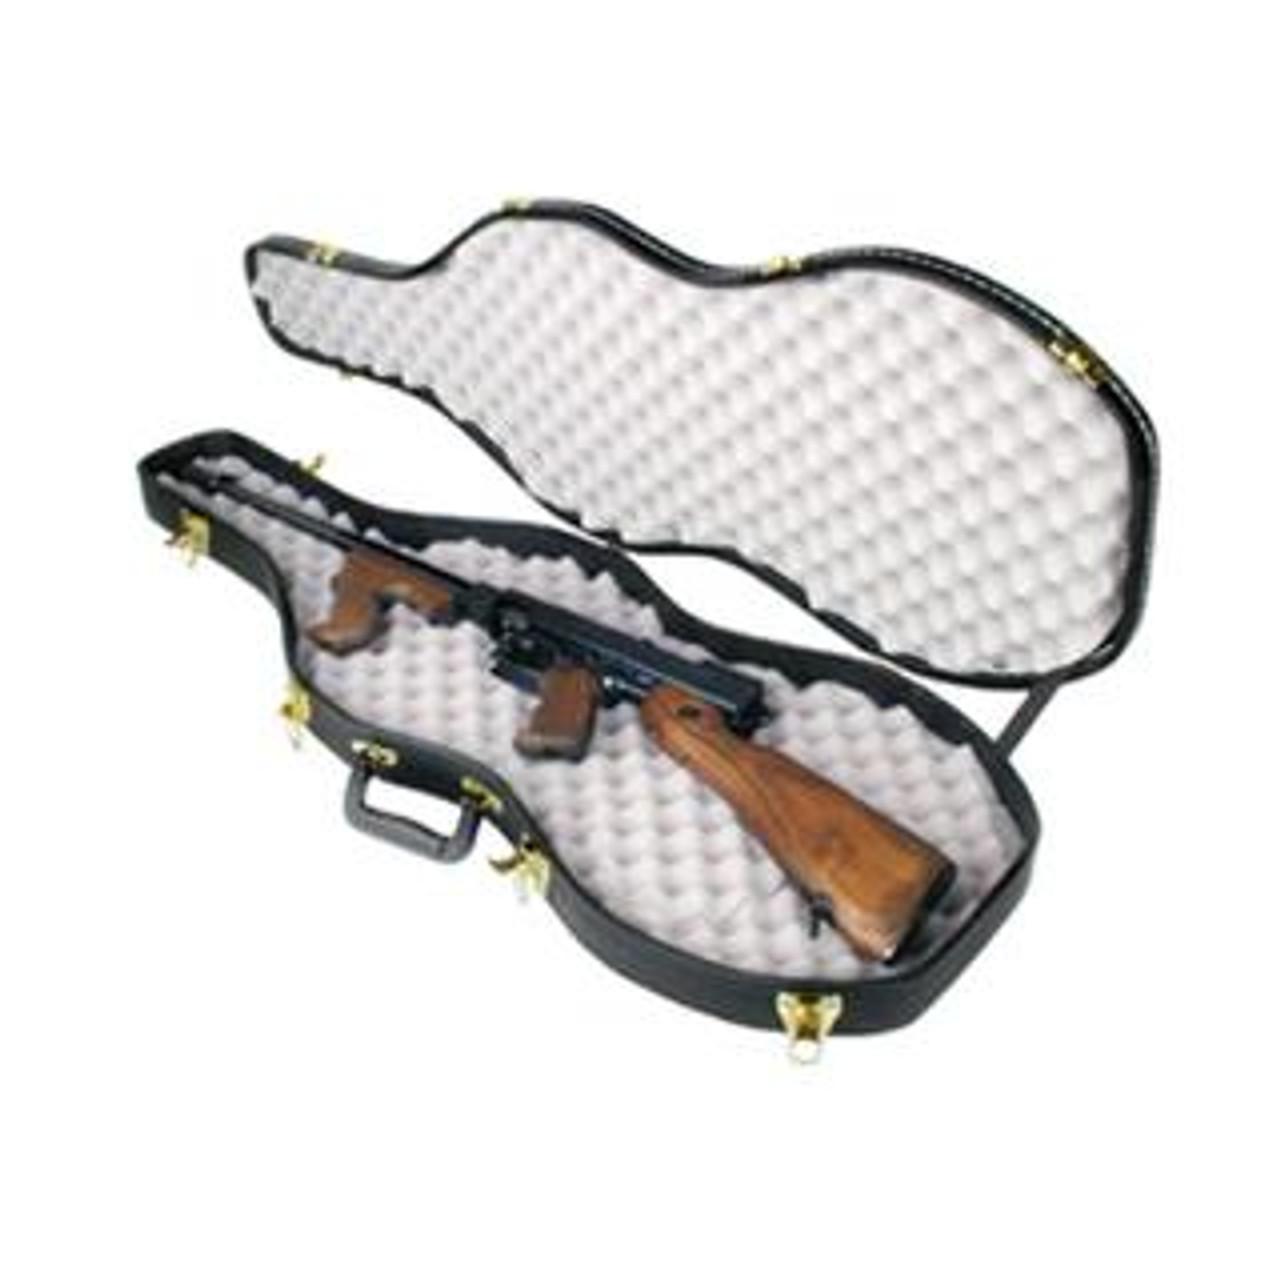 Thompson 1927 A1 Deluxe + Thompson Violin Case Combo CALIFORNIA LEGAL - .45 ACP